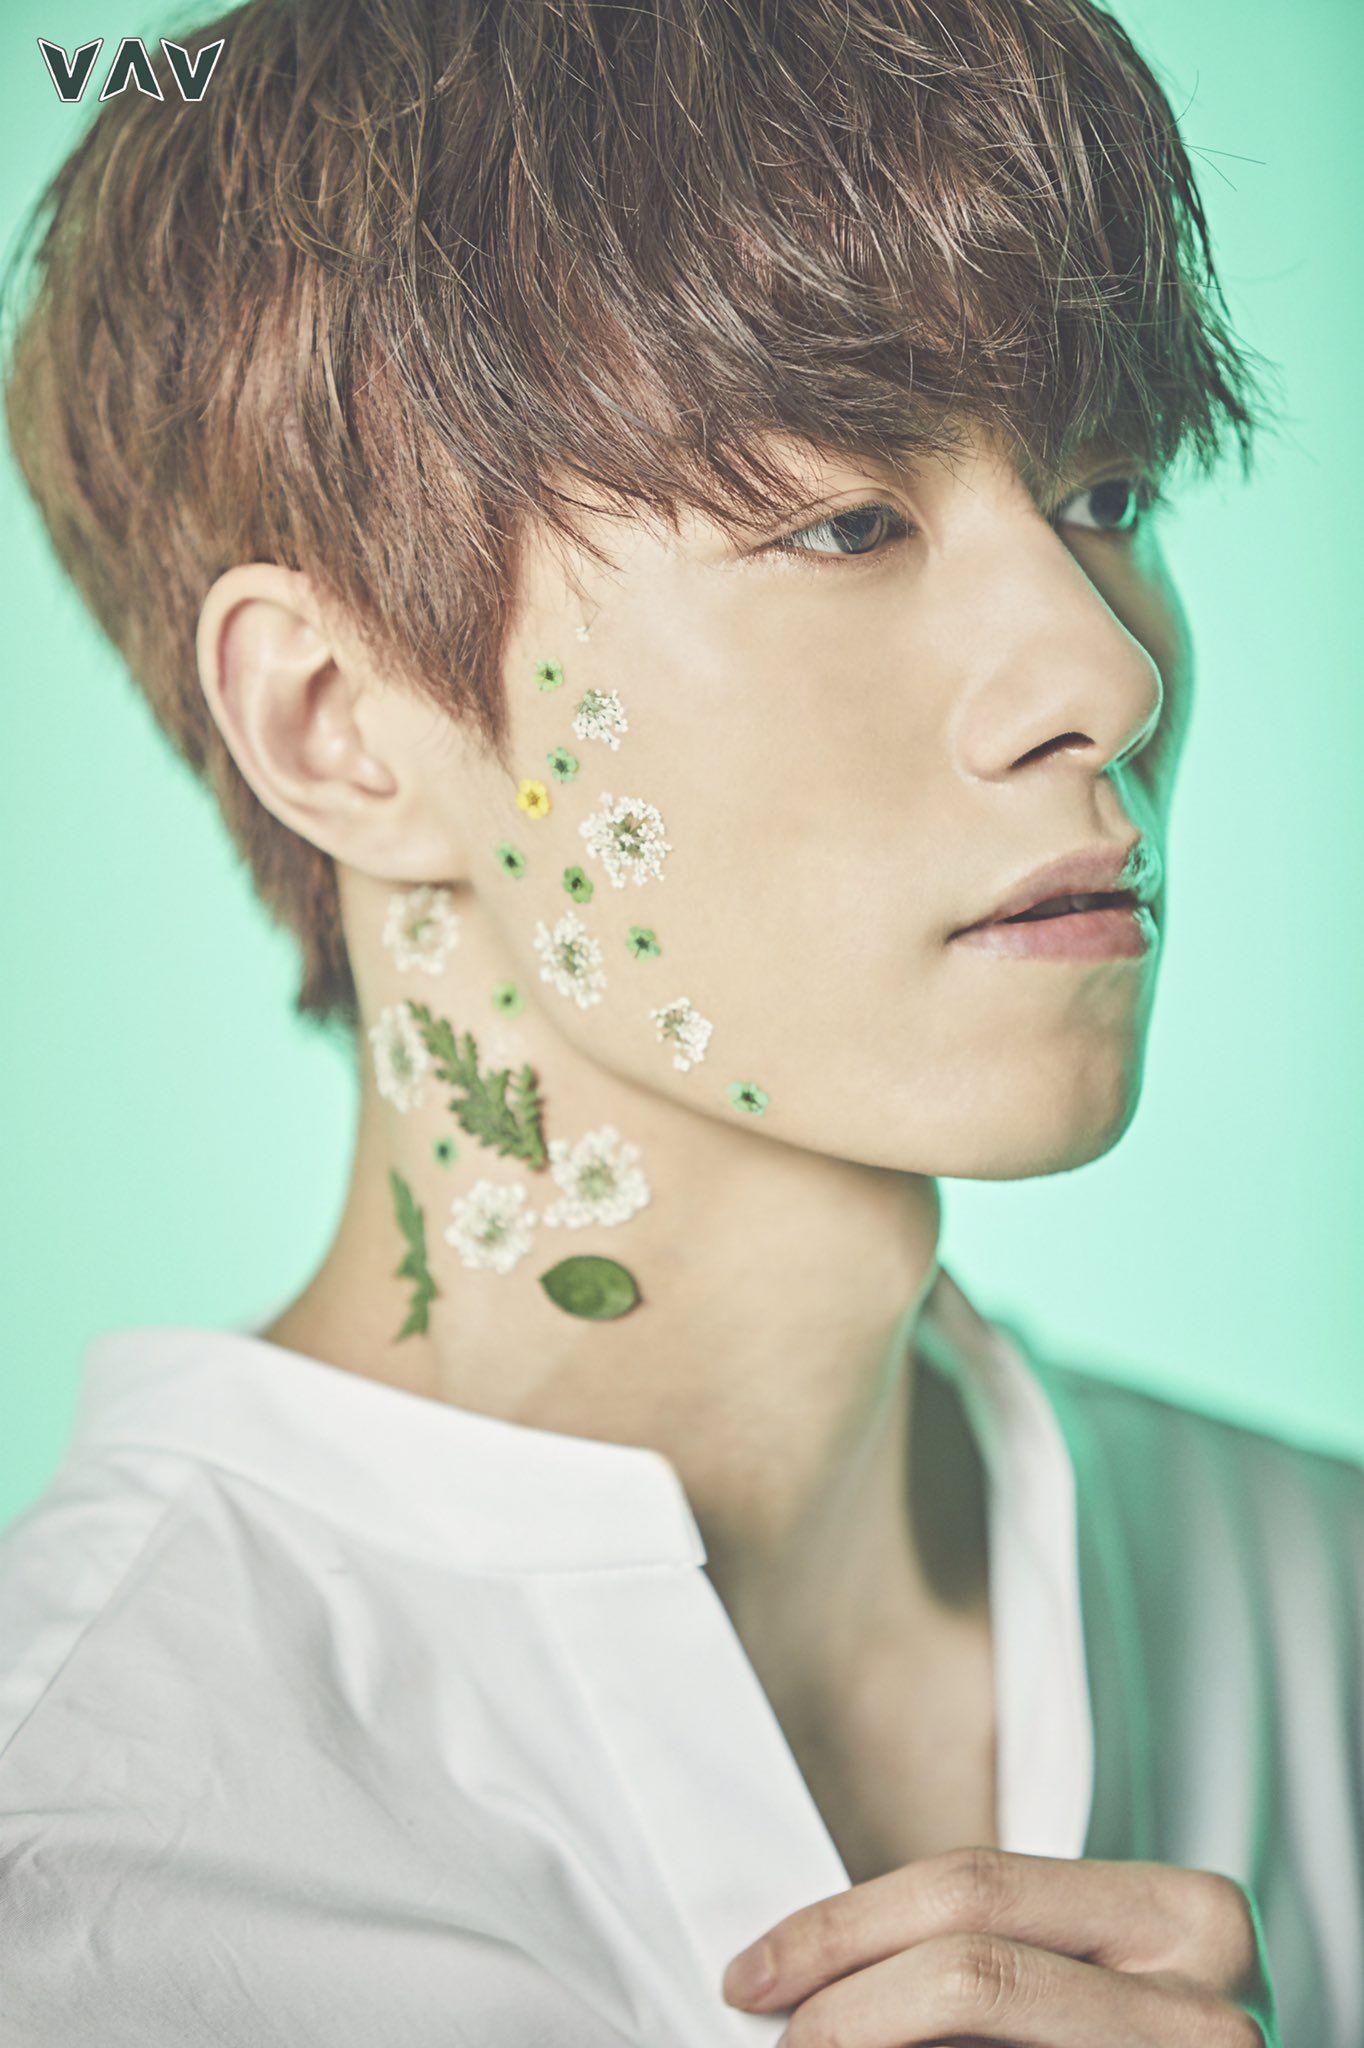 Jacob Vav 2nd Digital Single Album Flower Concept